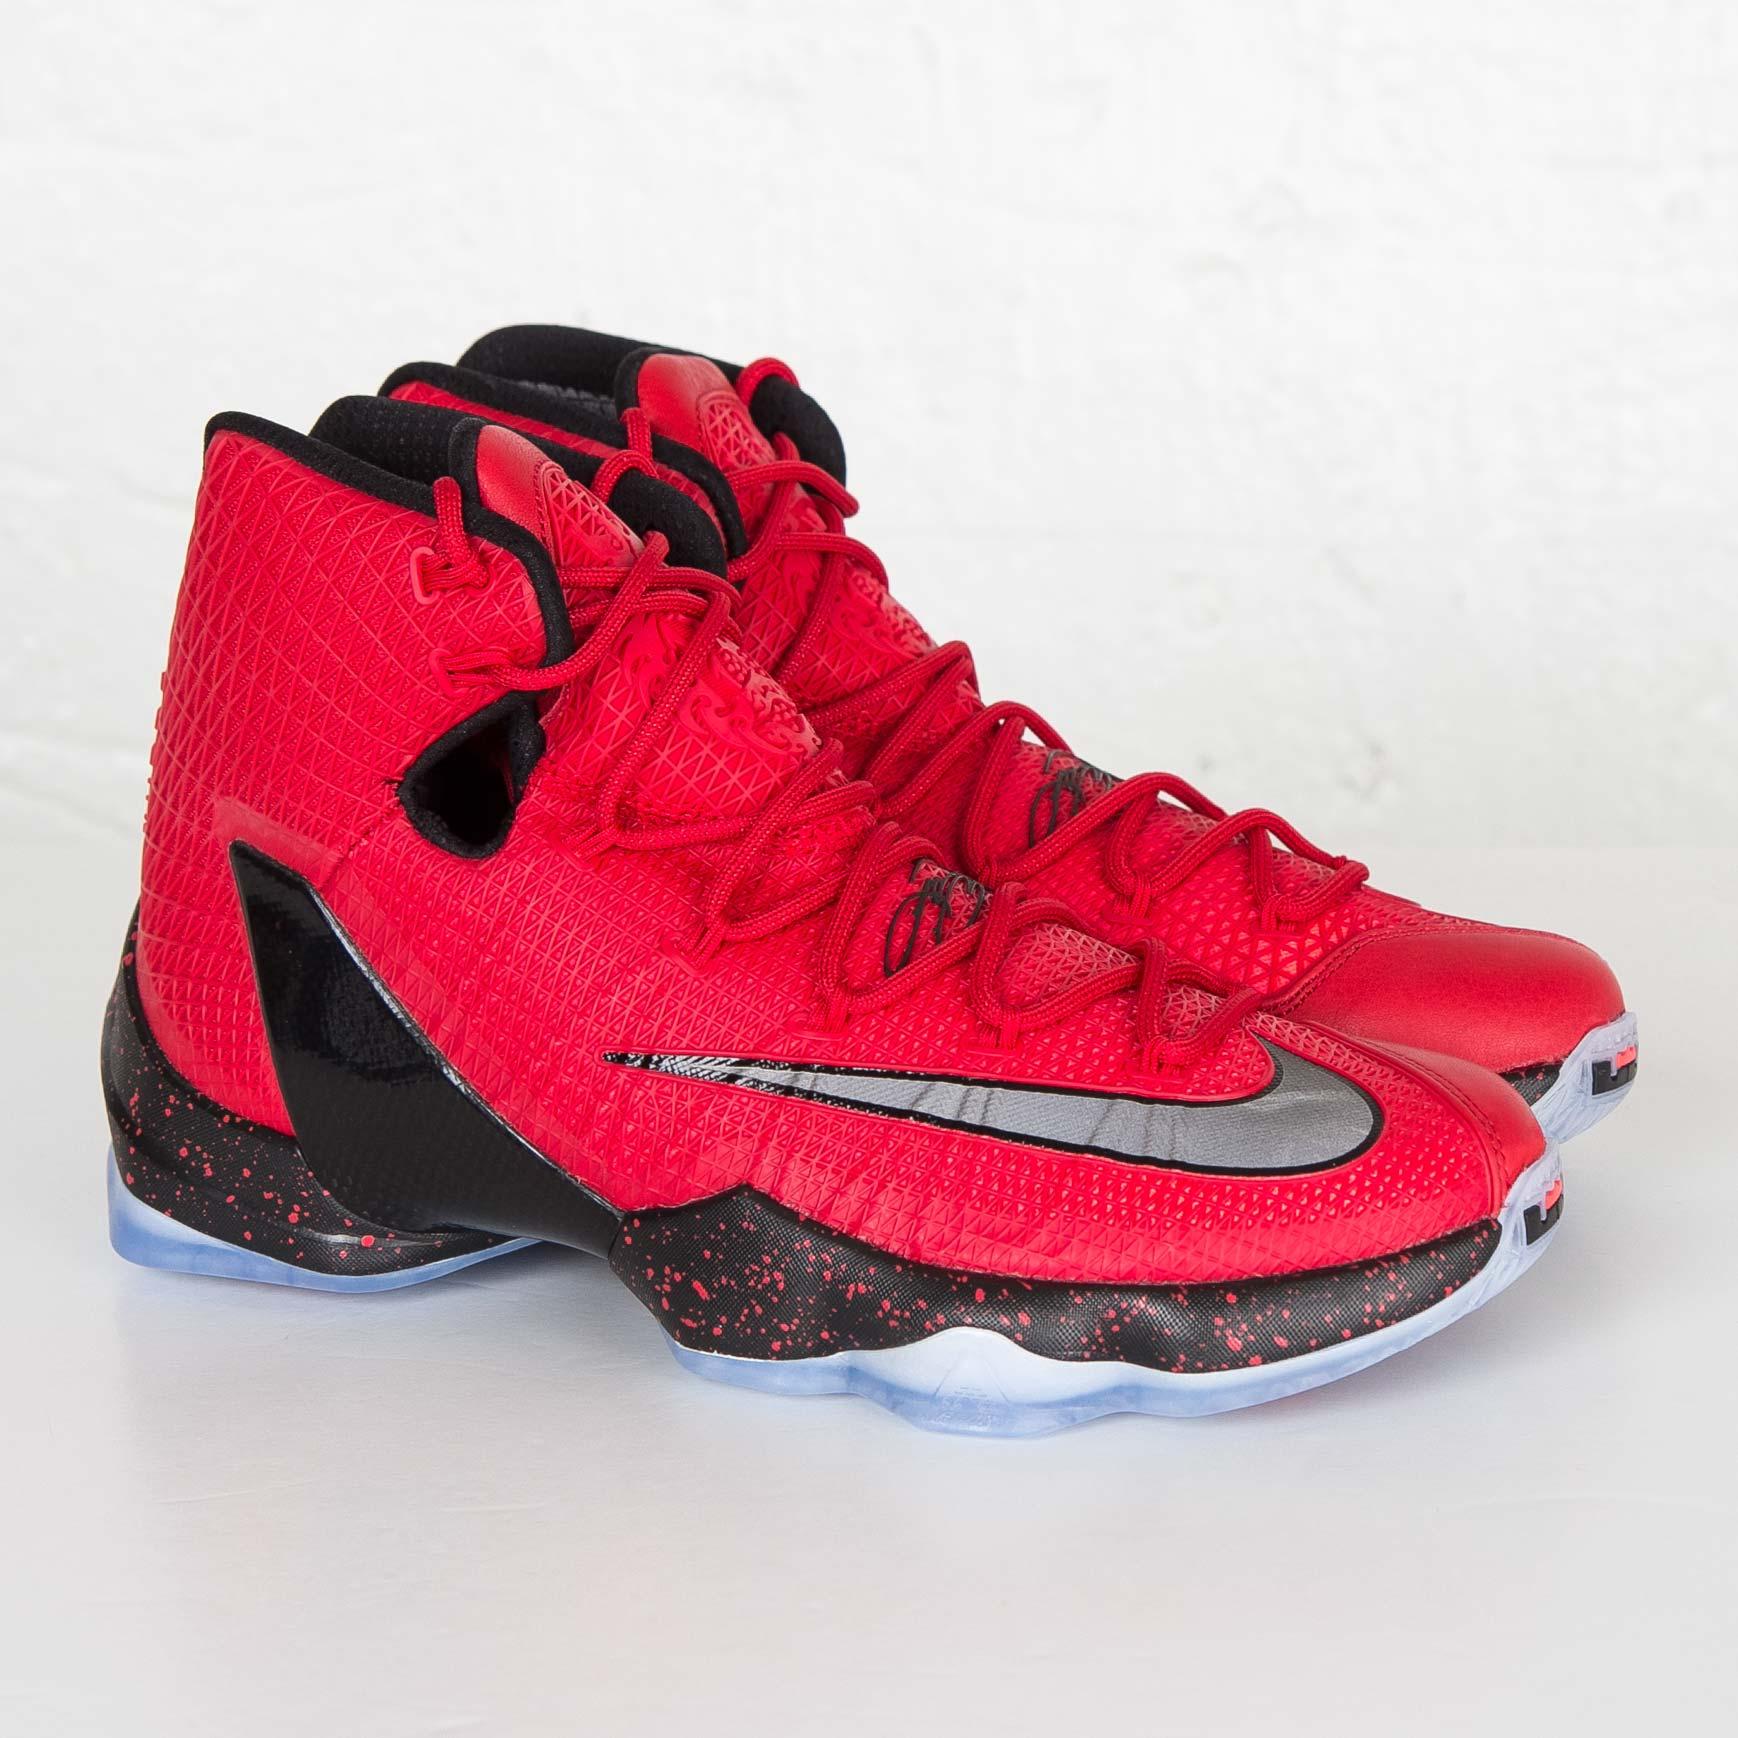 newest 9a827 7f1a2 Nike Lebron XIII Elite